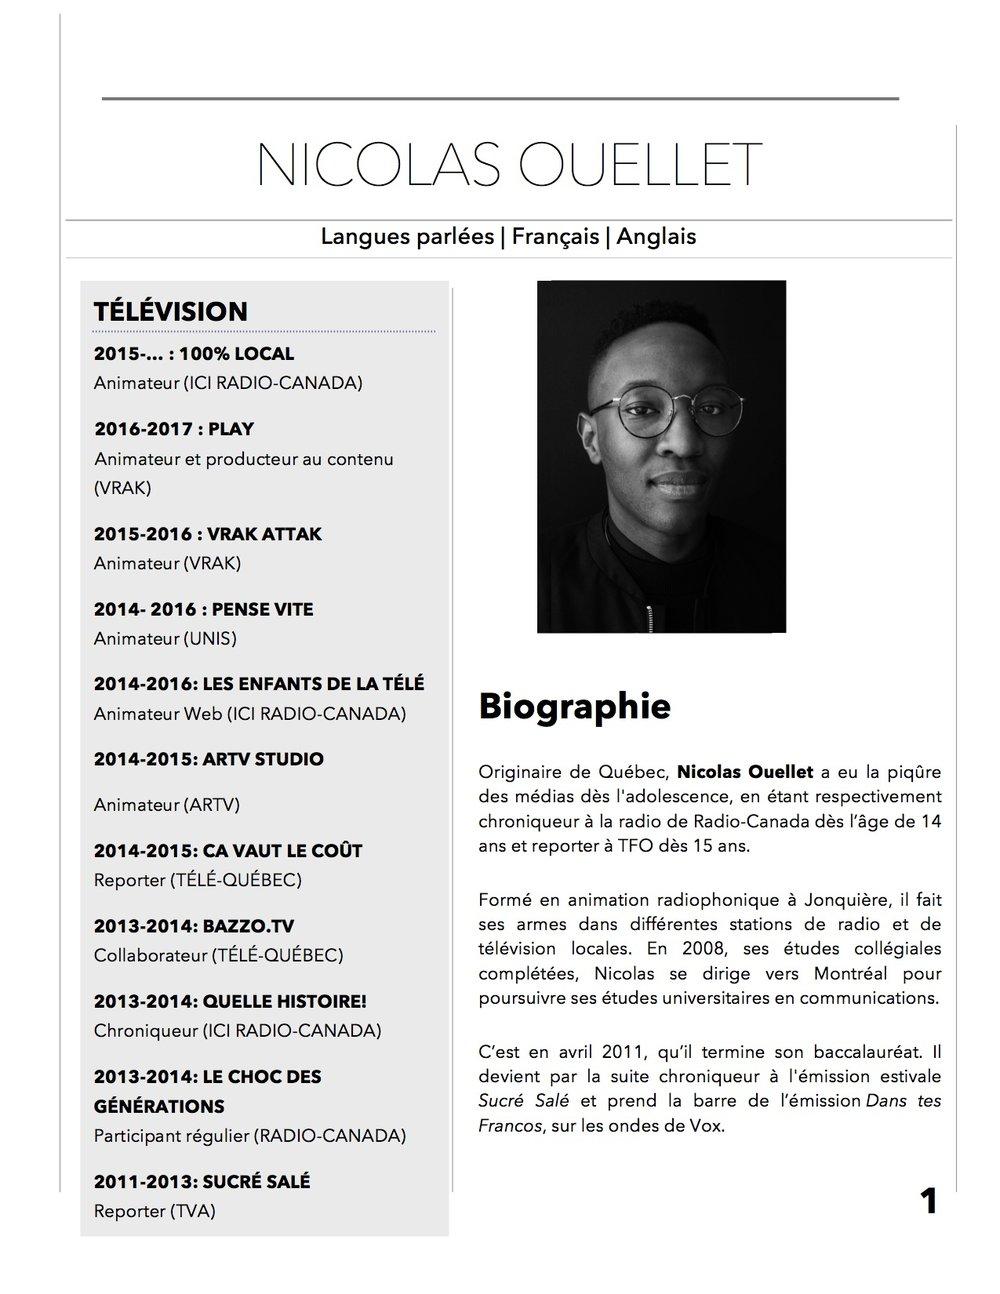 NicolasOuellet_CV_2018.jpg